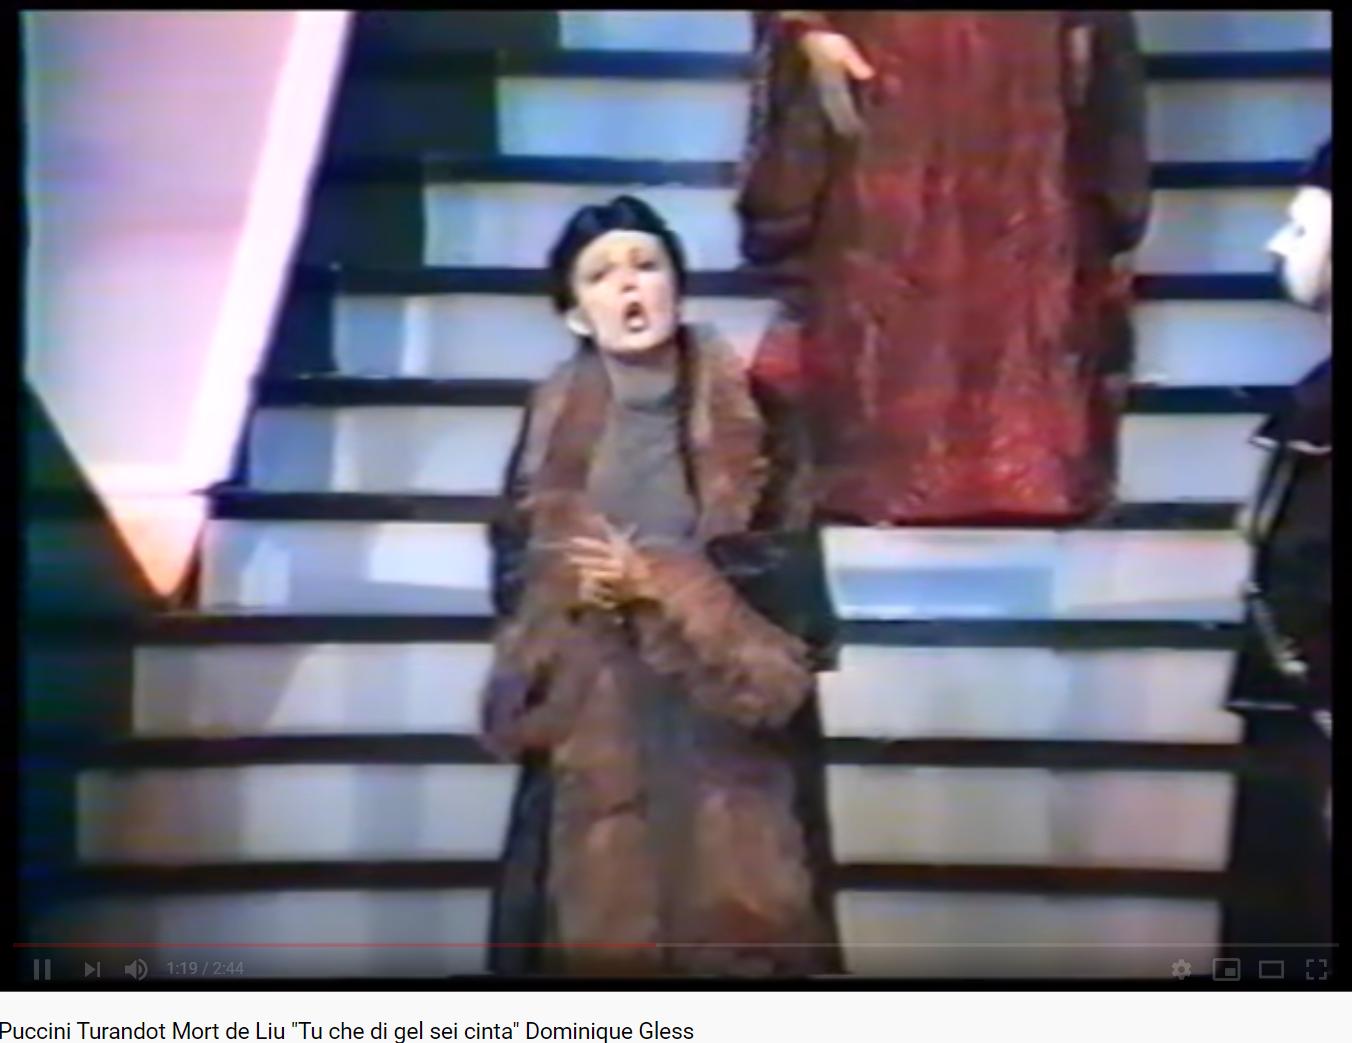 Puccini Turandot Tu che di gel sei cinta (Domnique Gless)